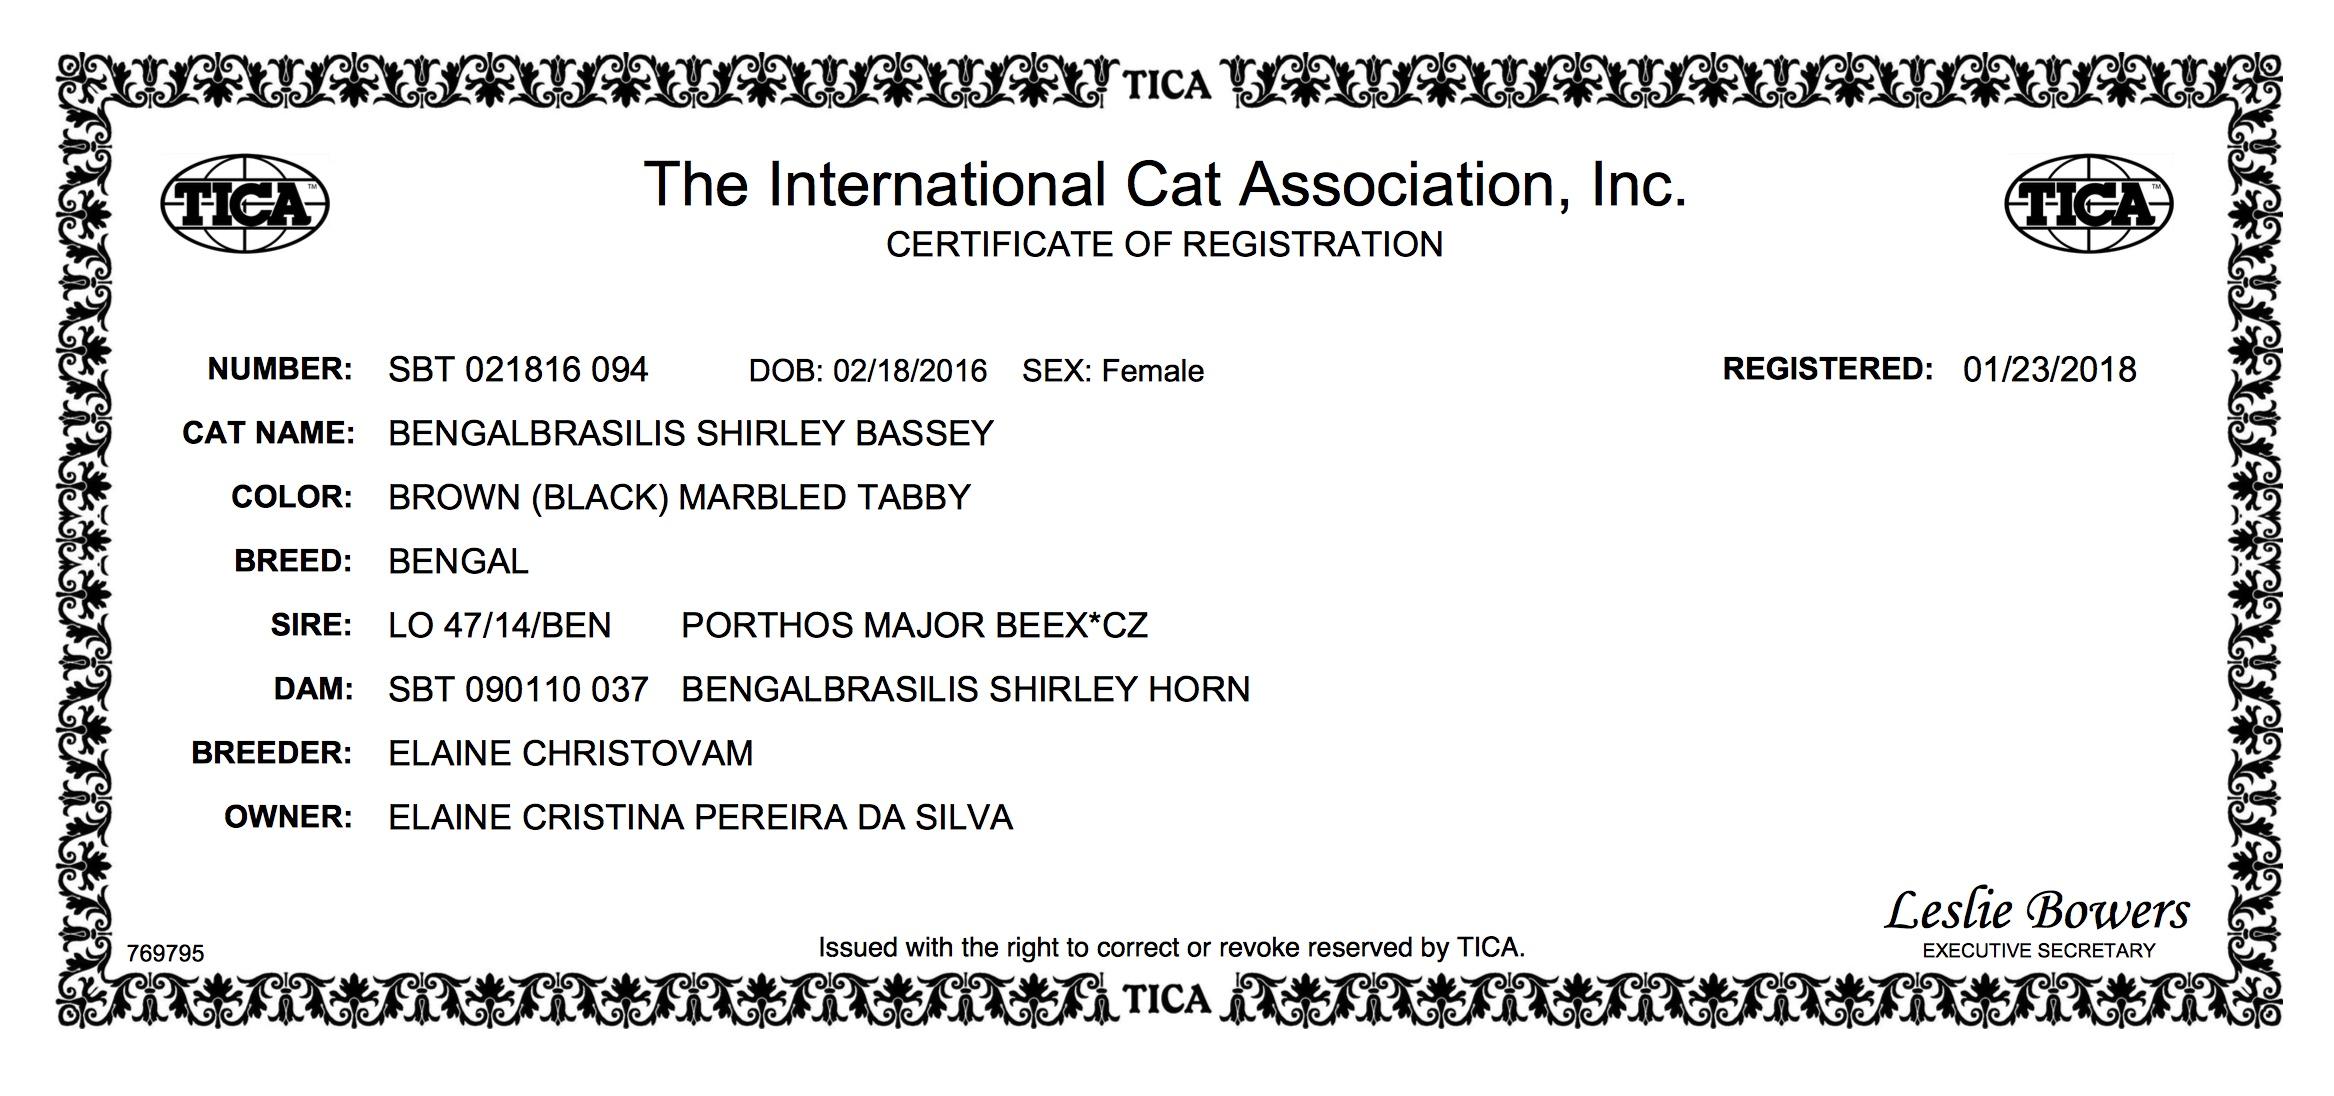 CERTIFICATE OF REGISTRATION Shirley Bassey.jpeg